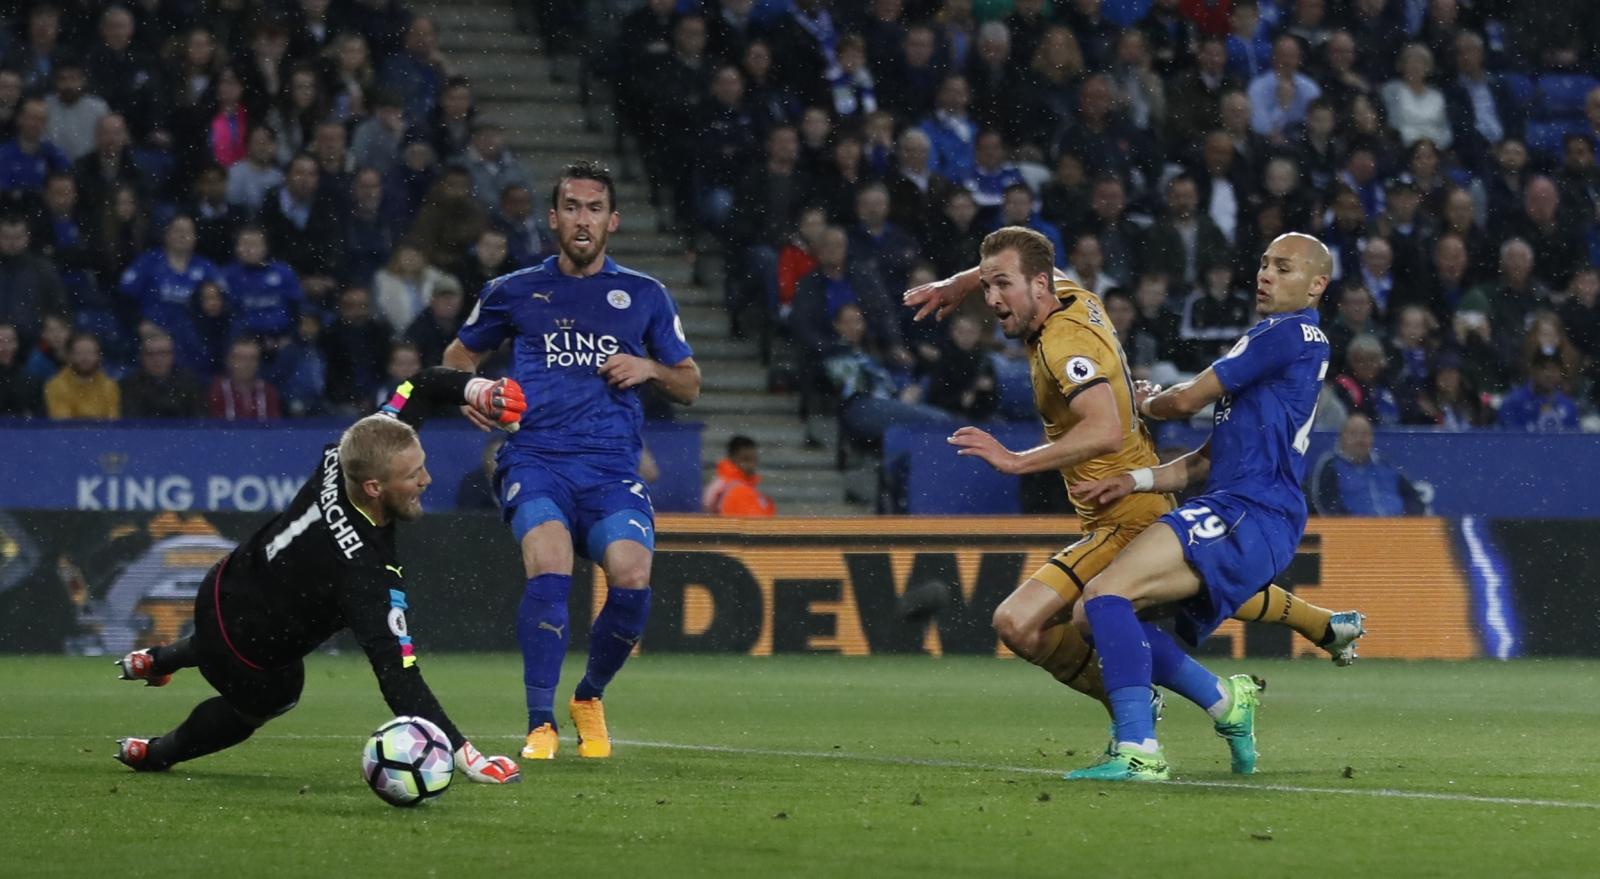 Tottenham Vs Leicester Predictions: Hull City Vs Tottenham Hotspur, Premier League 2016/17